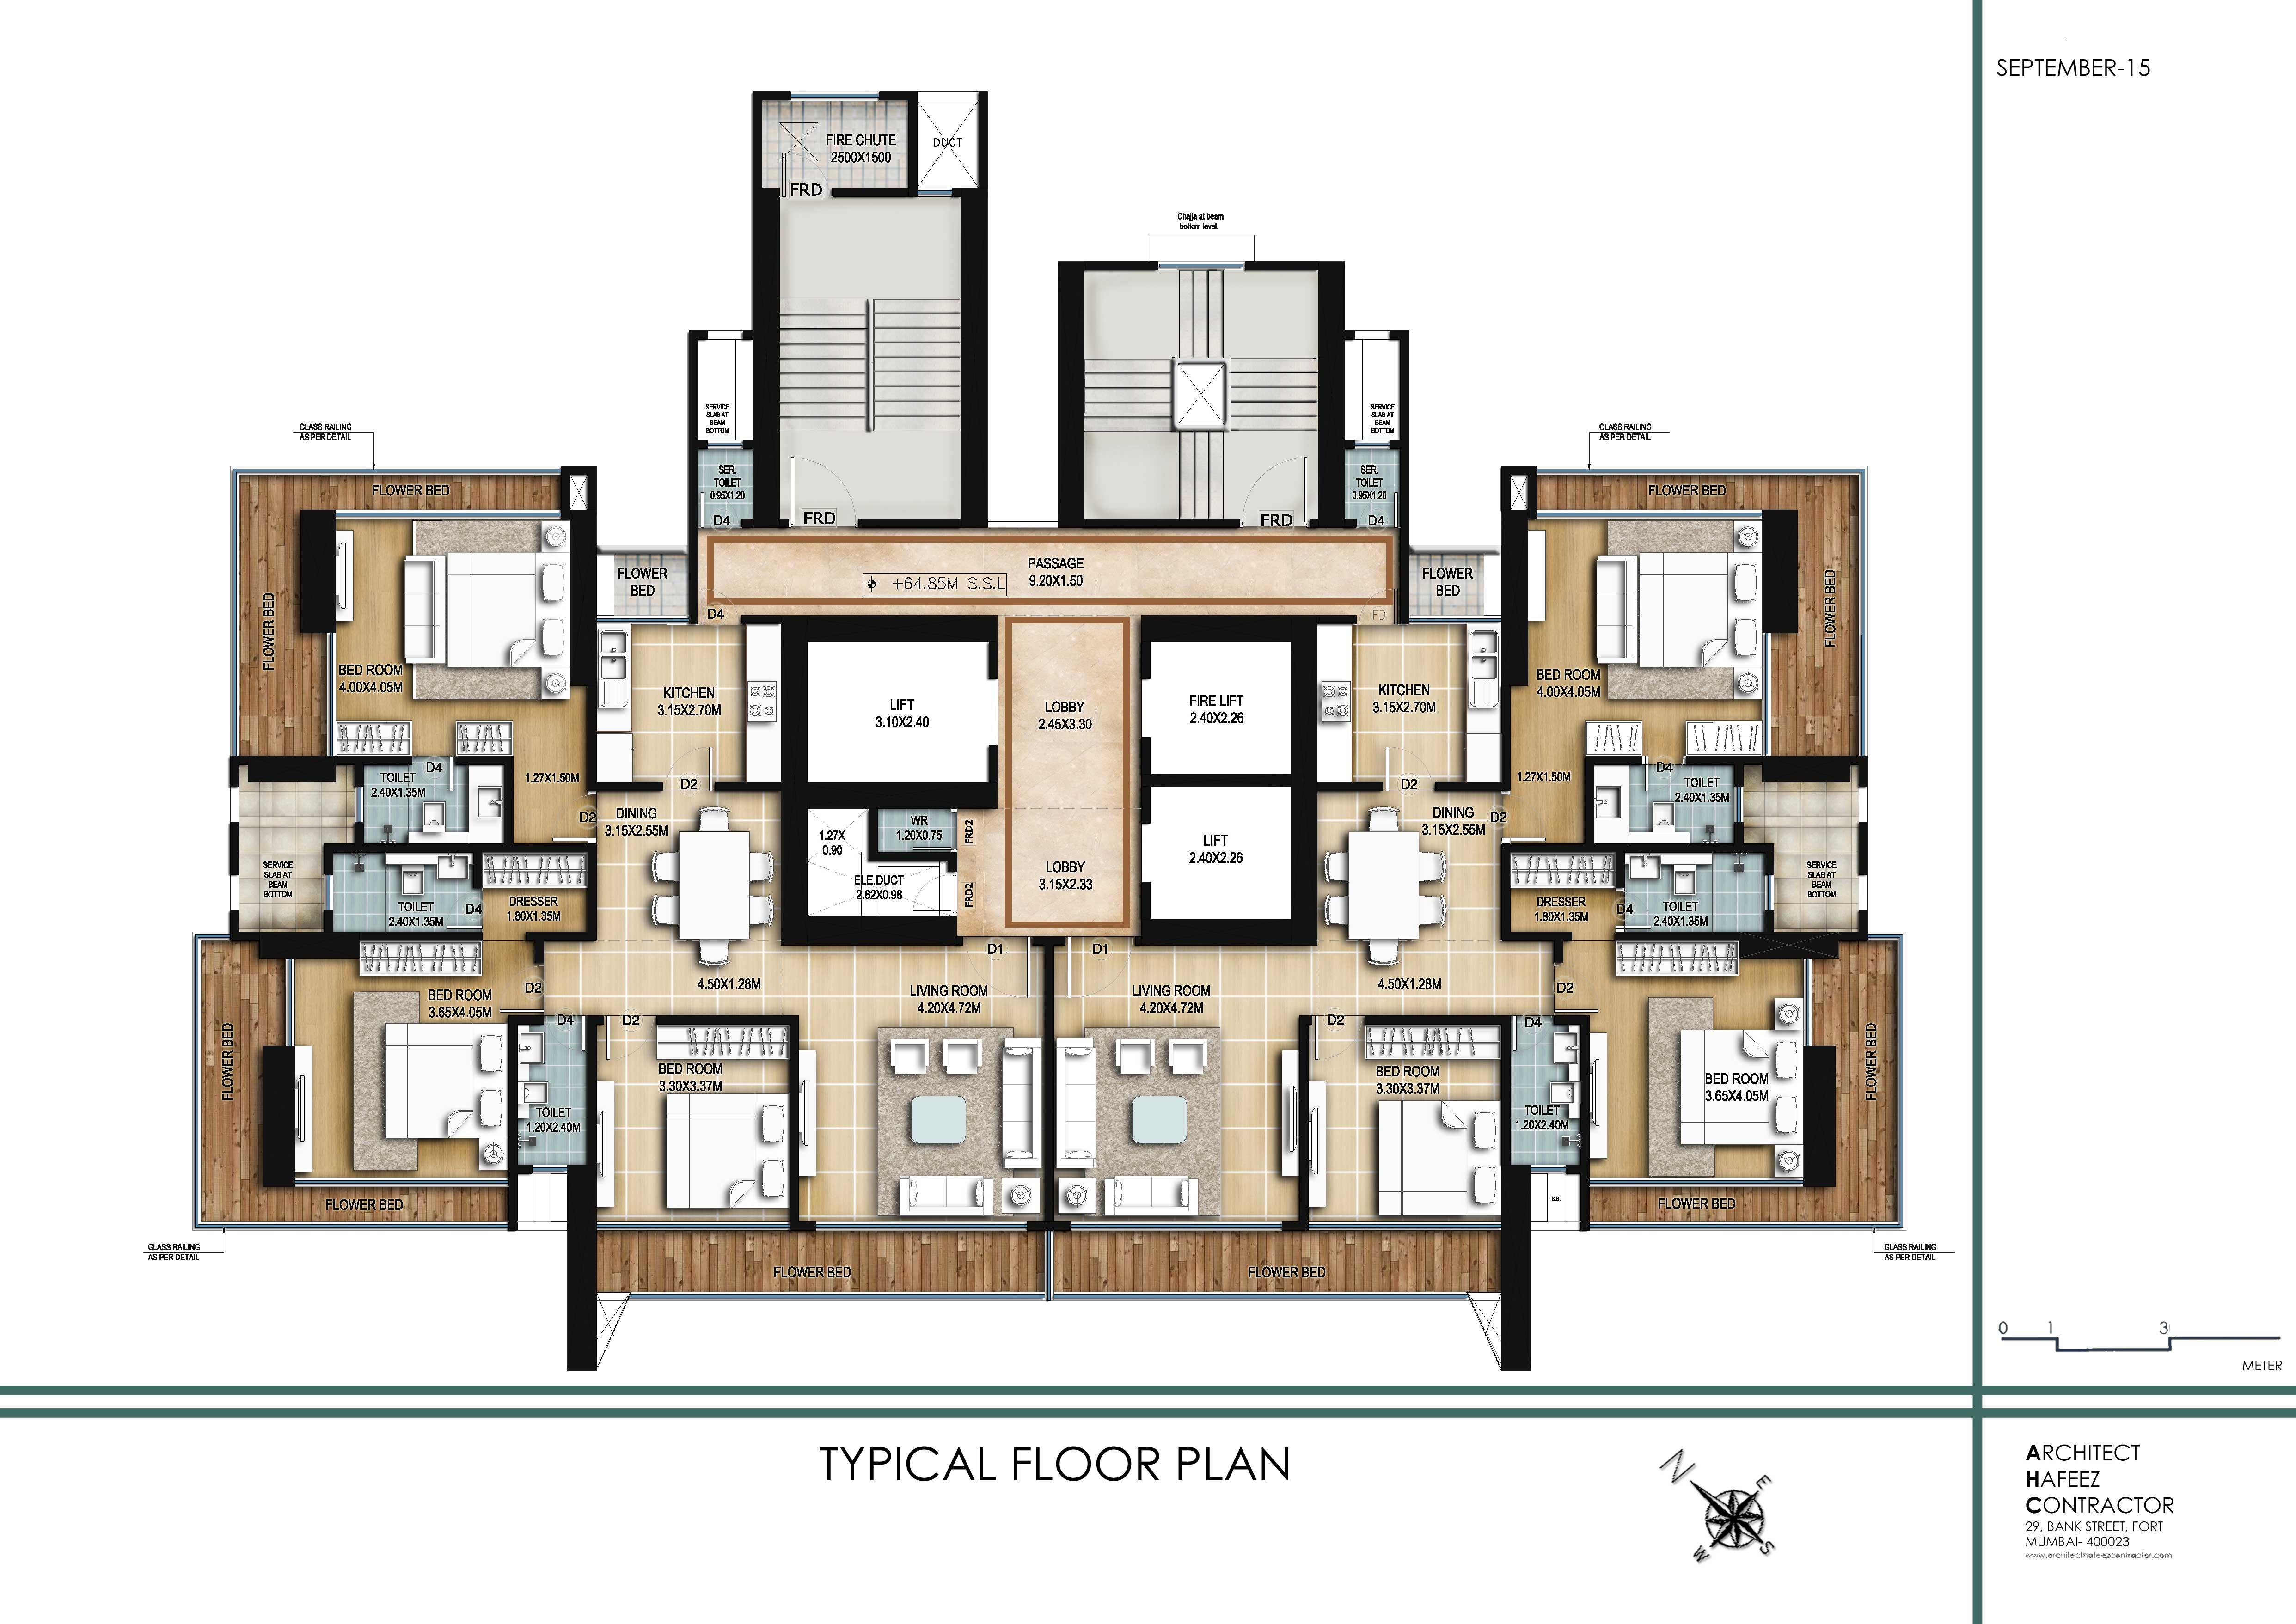 Typical Floor Plan of 3 BHK